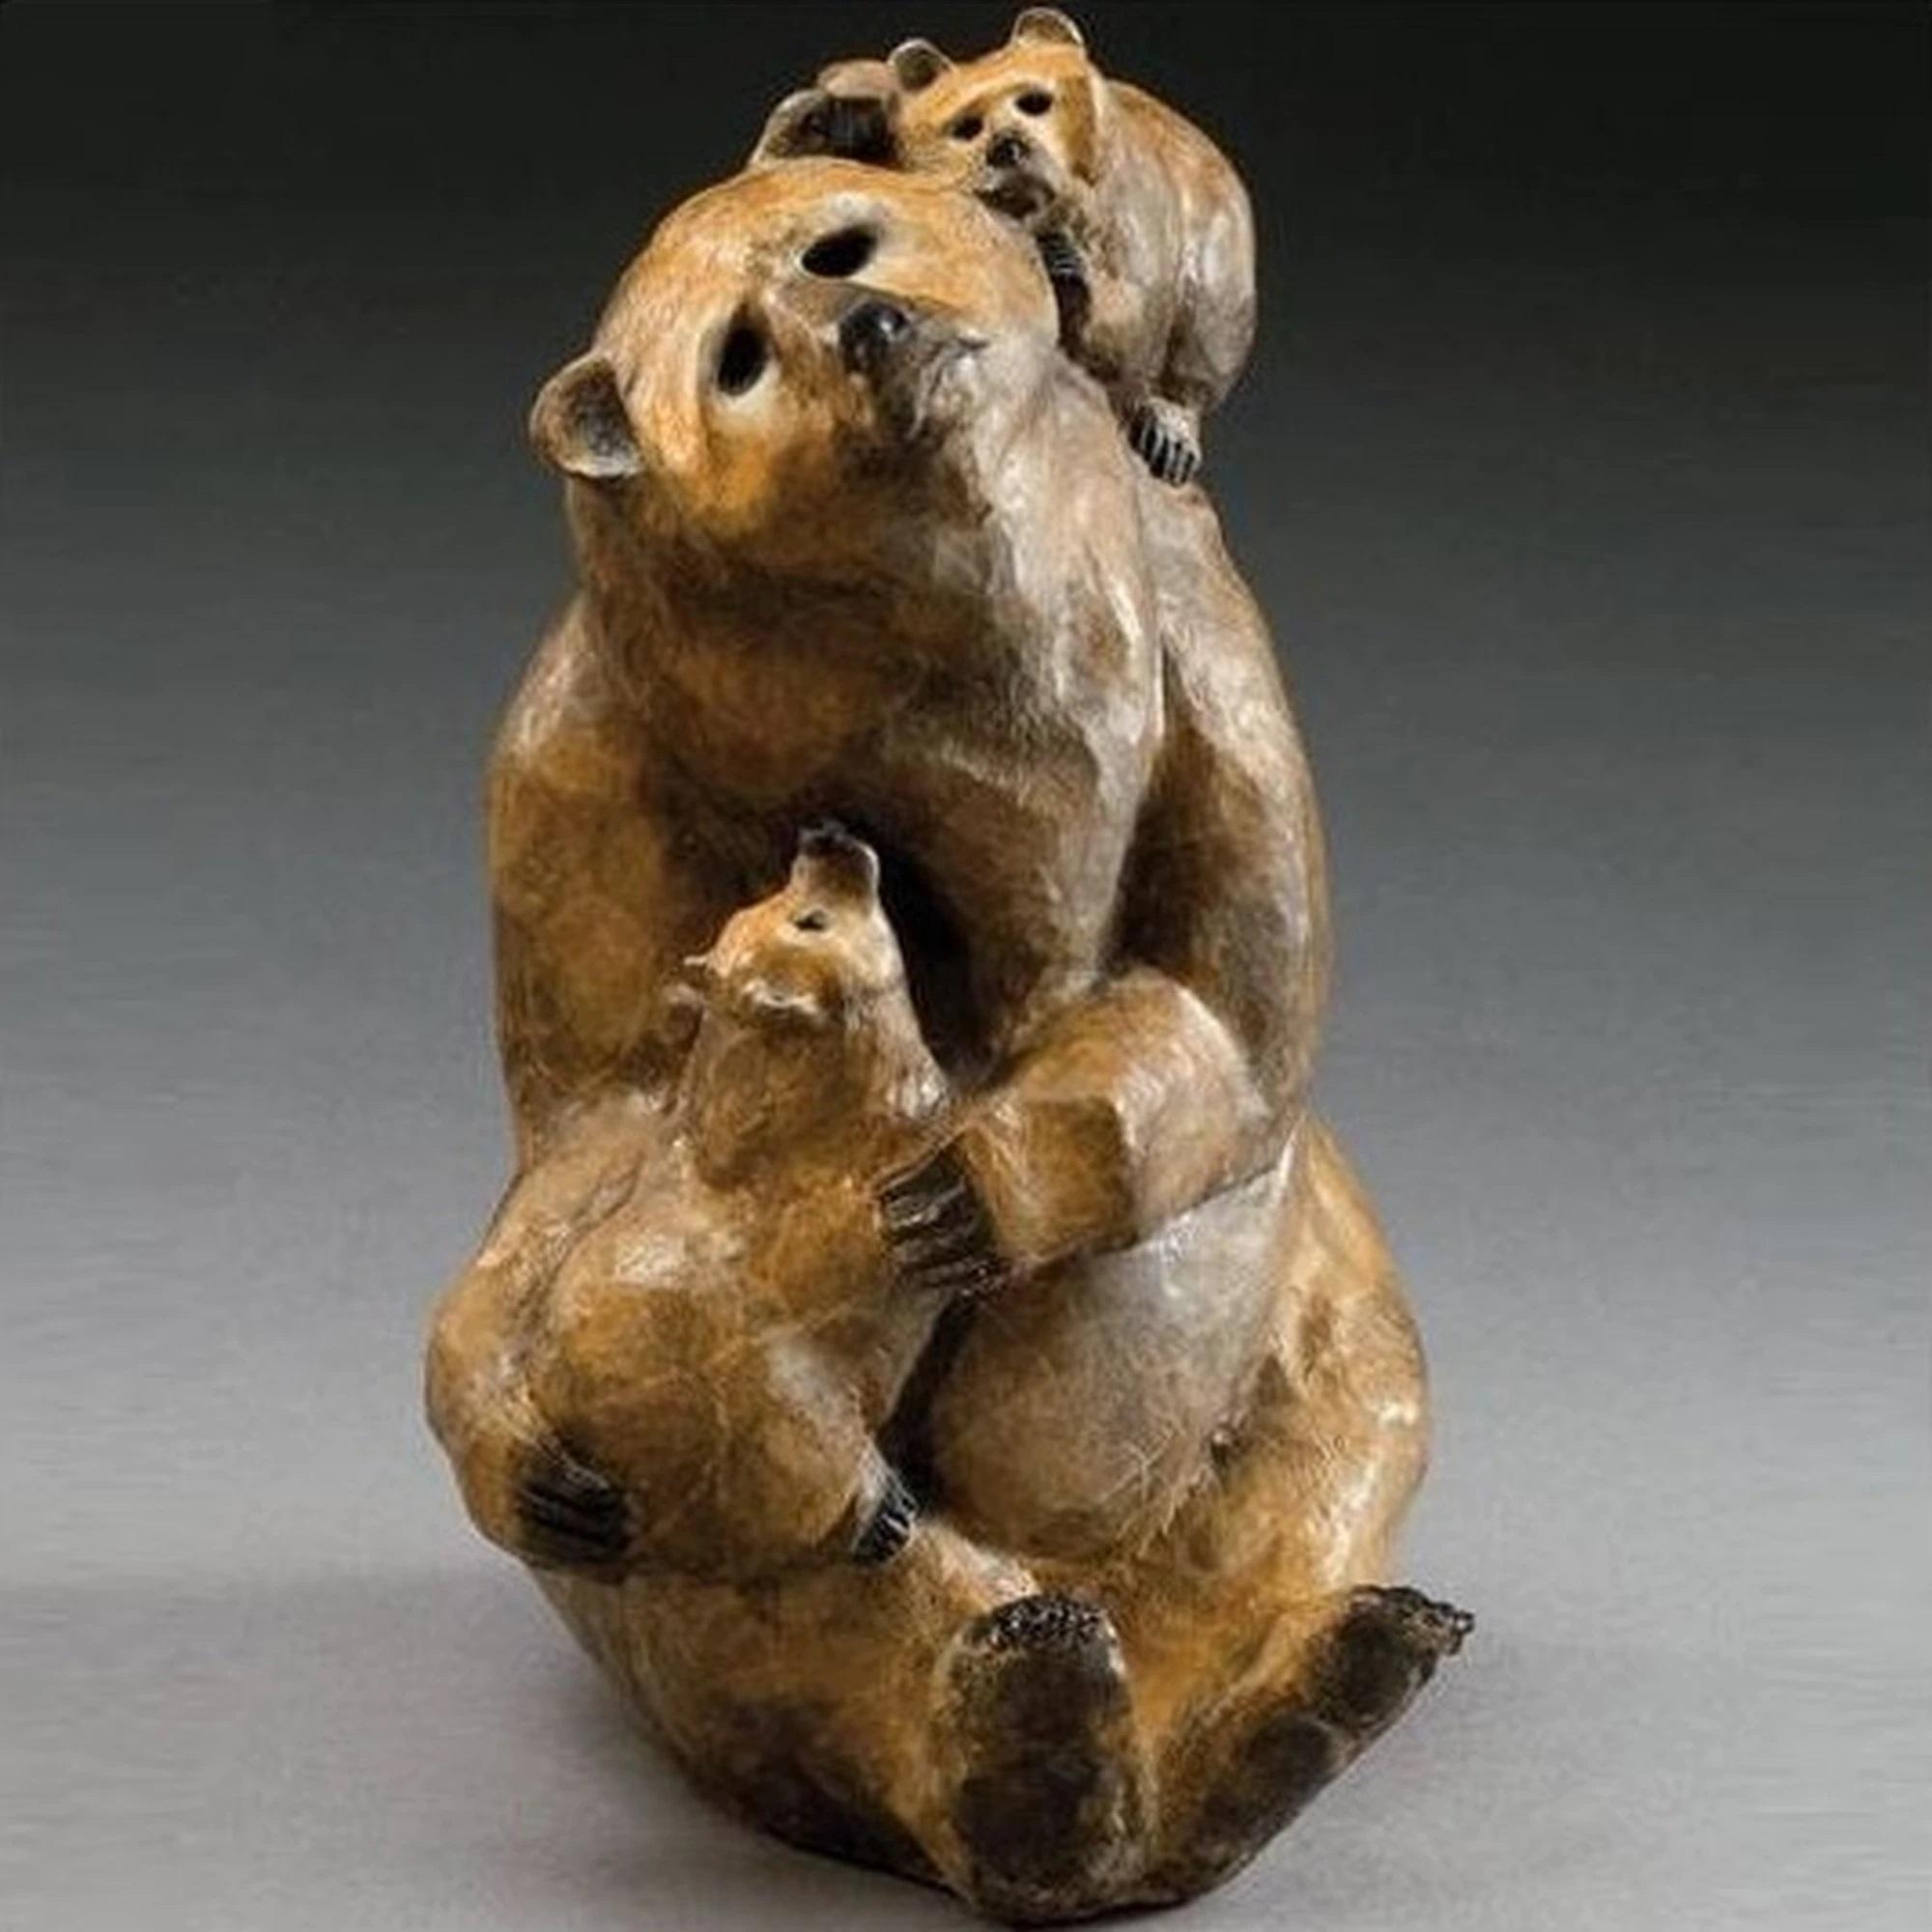 A Family of Bronze Lovely Kodiak Bear Sculpture for a Decor